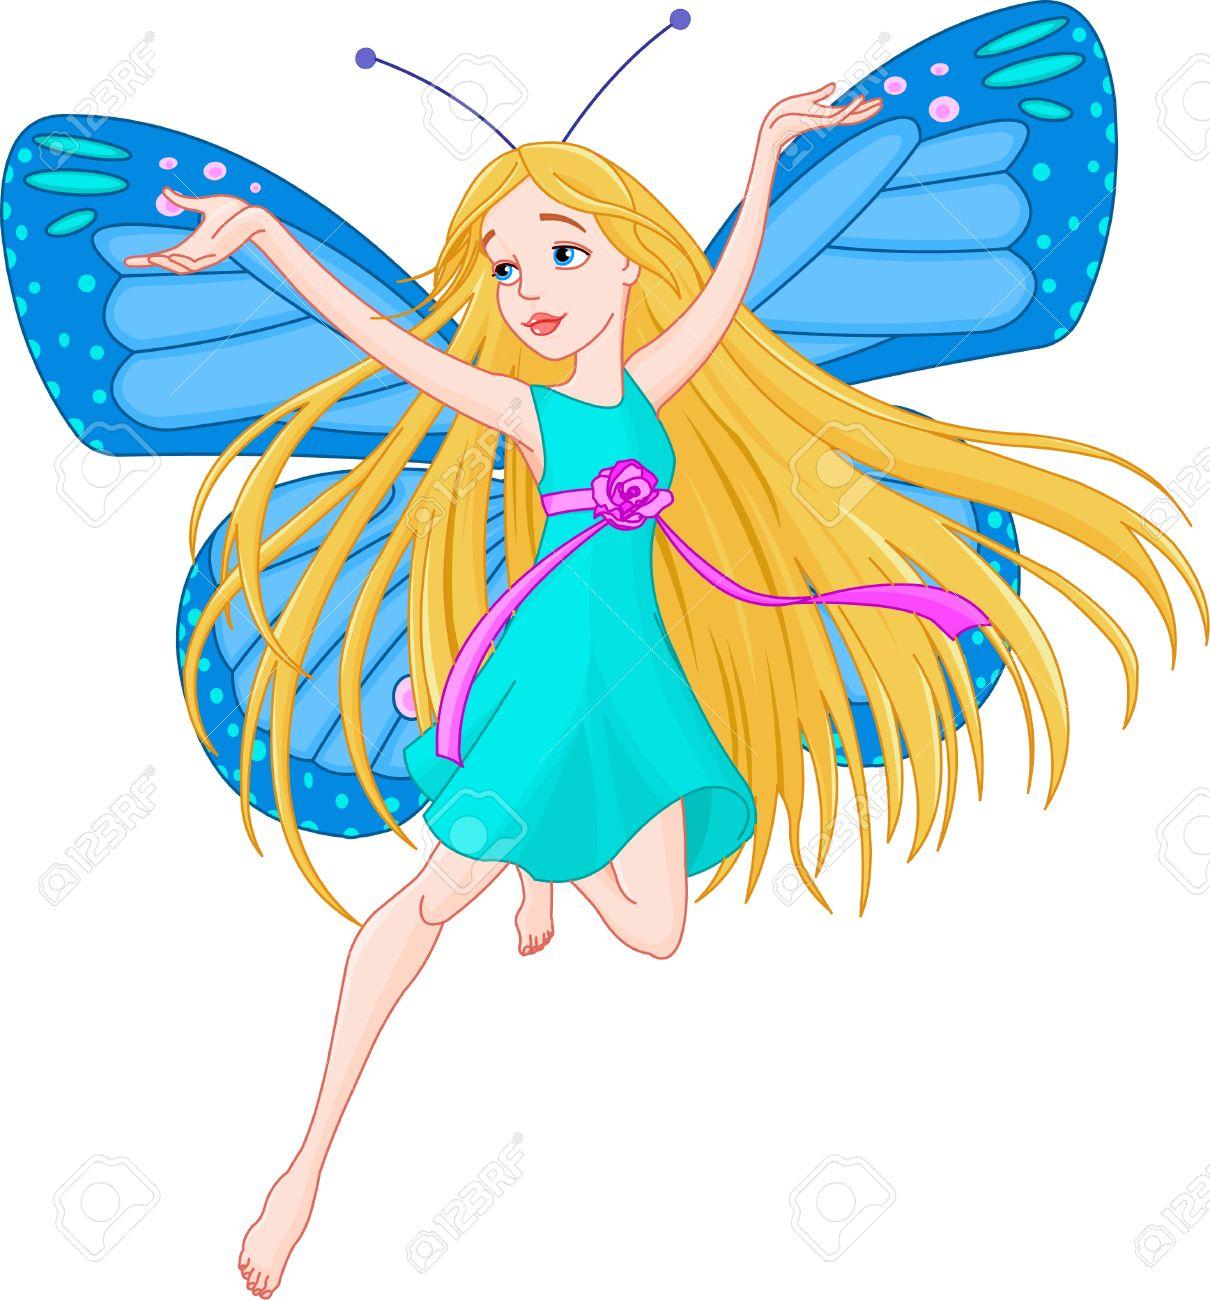 Fairy-tale, fairy, dftterfly wings Stock Vector - 3838440